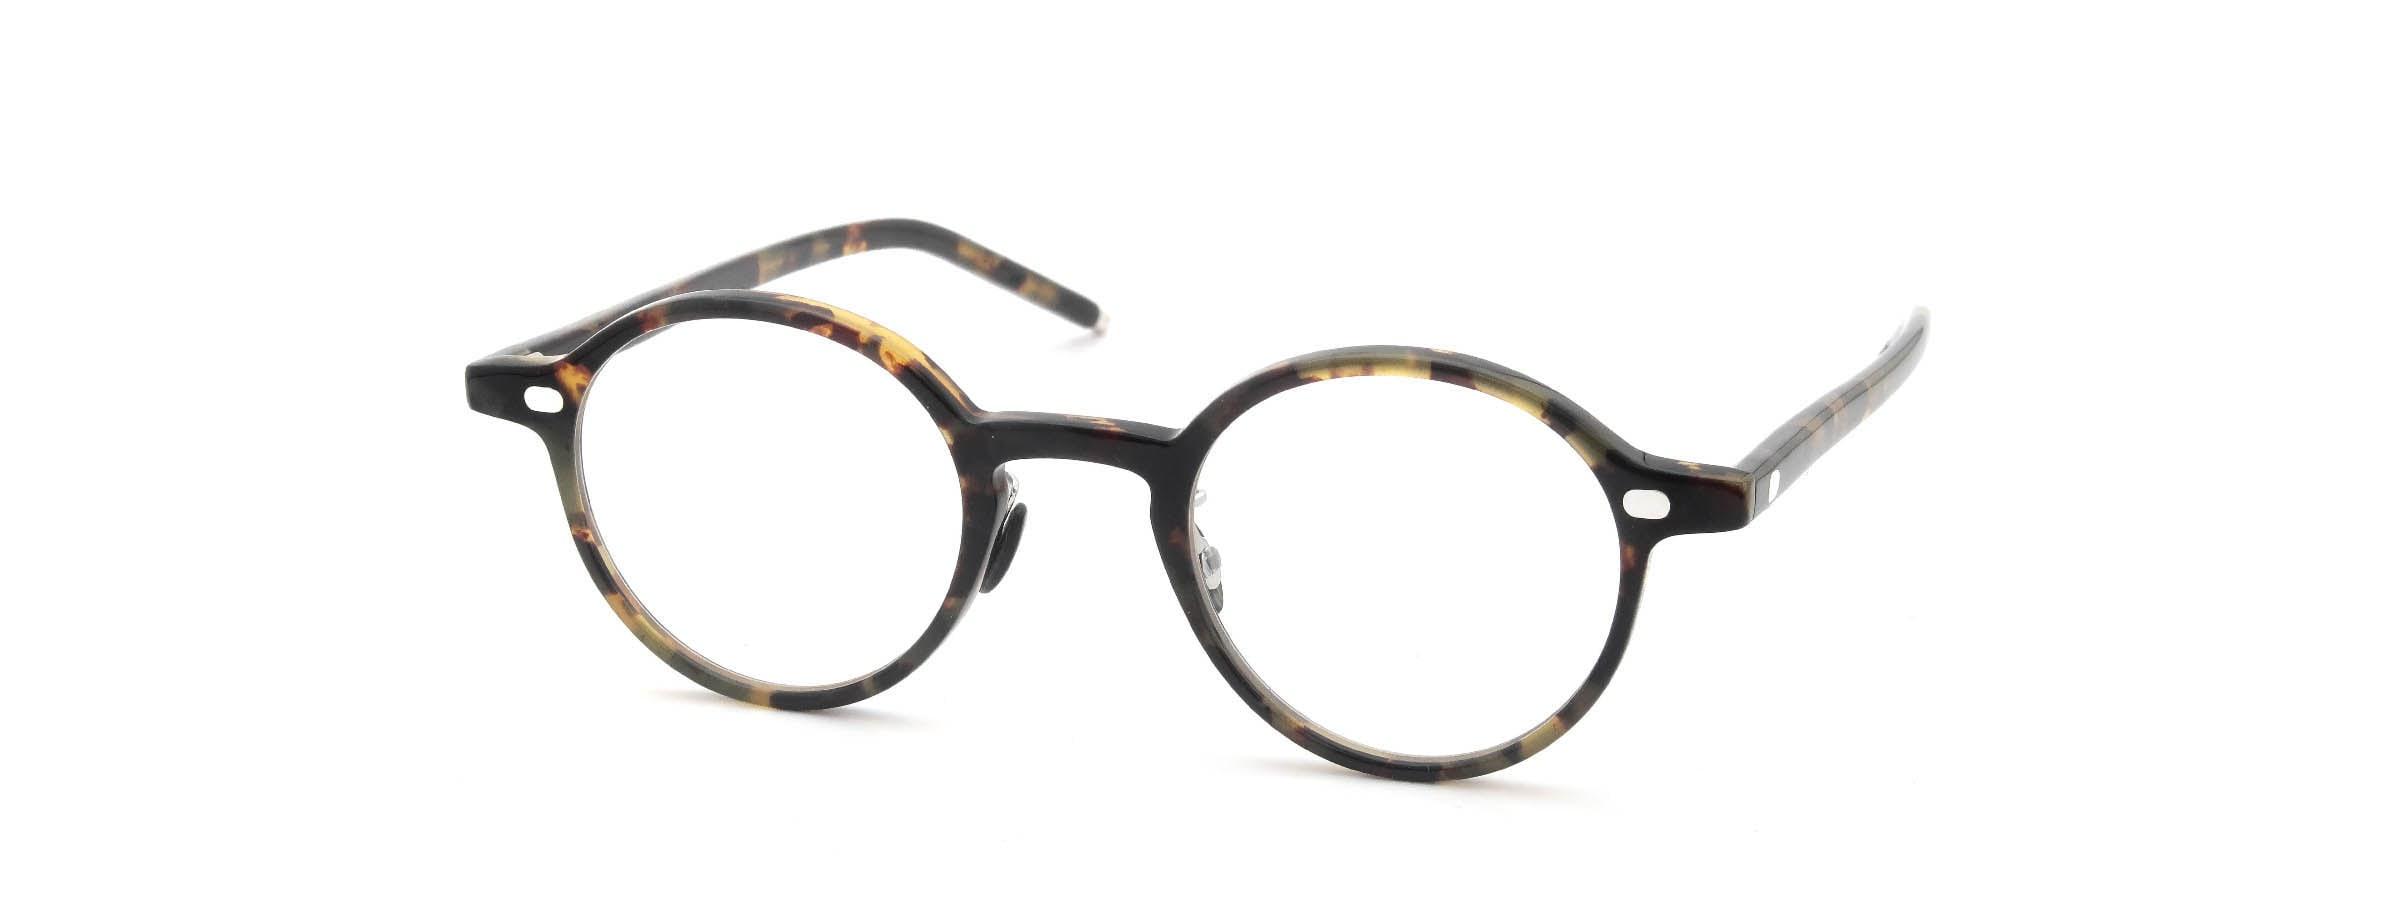 10 eyevan NO.5 Ⅲ 43size  c.1005S Havana全体像